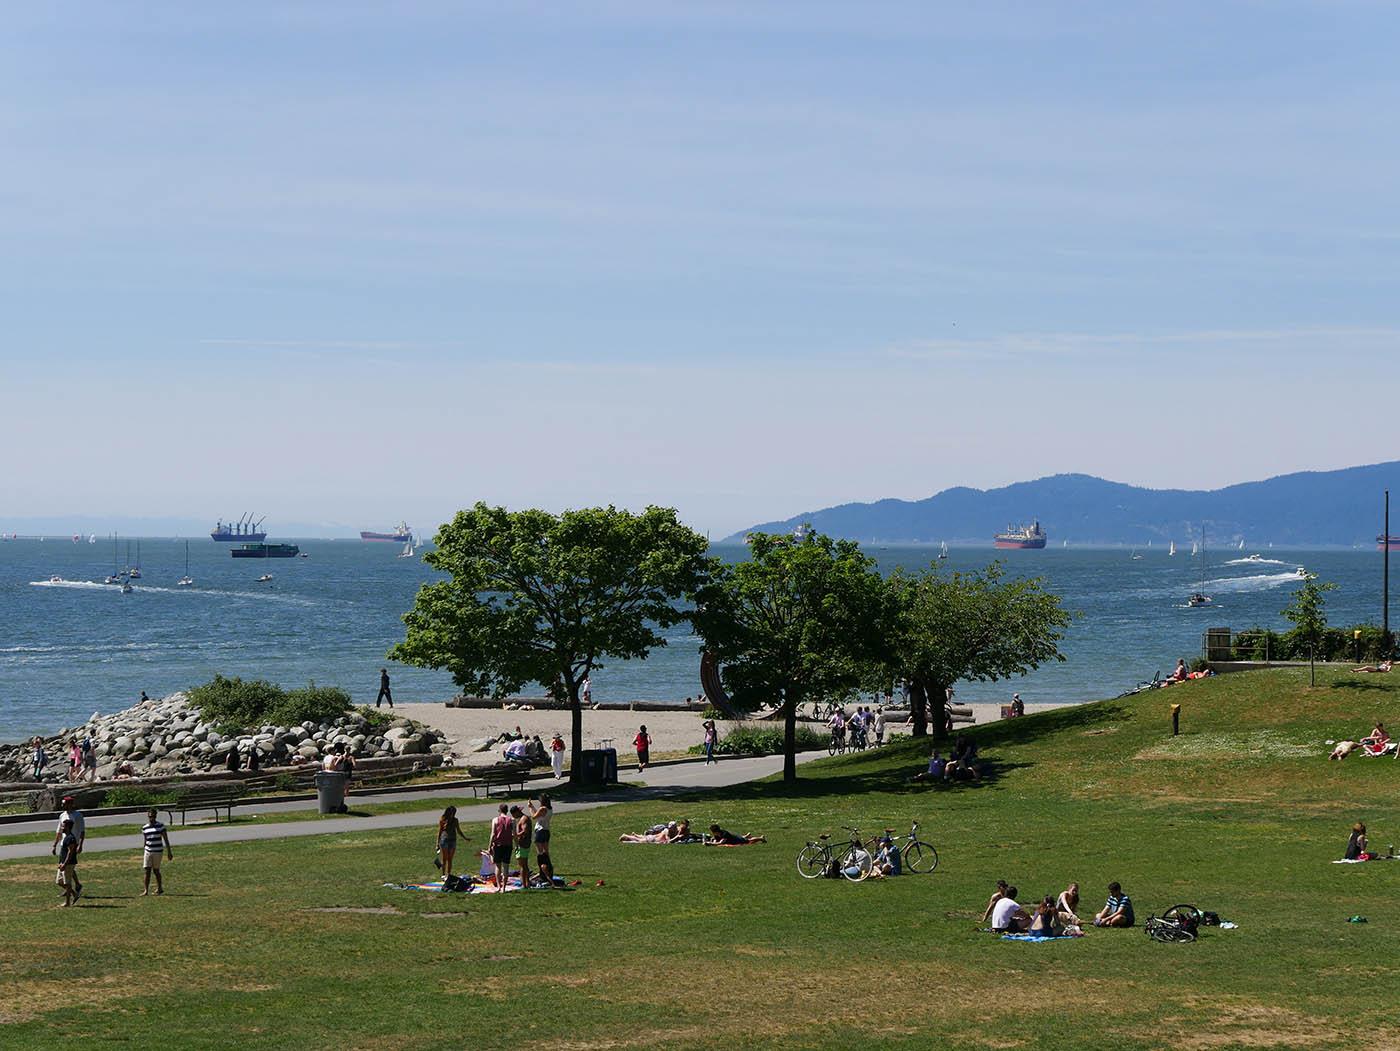 Meilleur quartier où dormir Vancouver